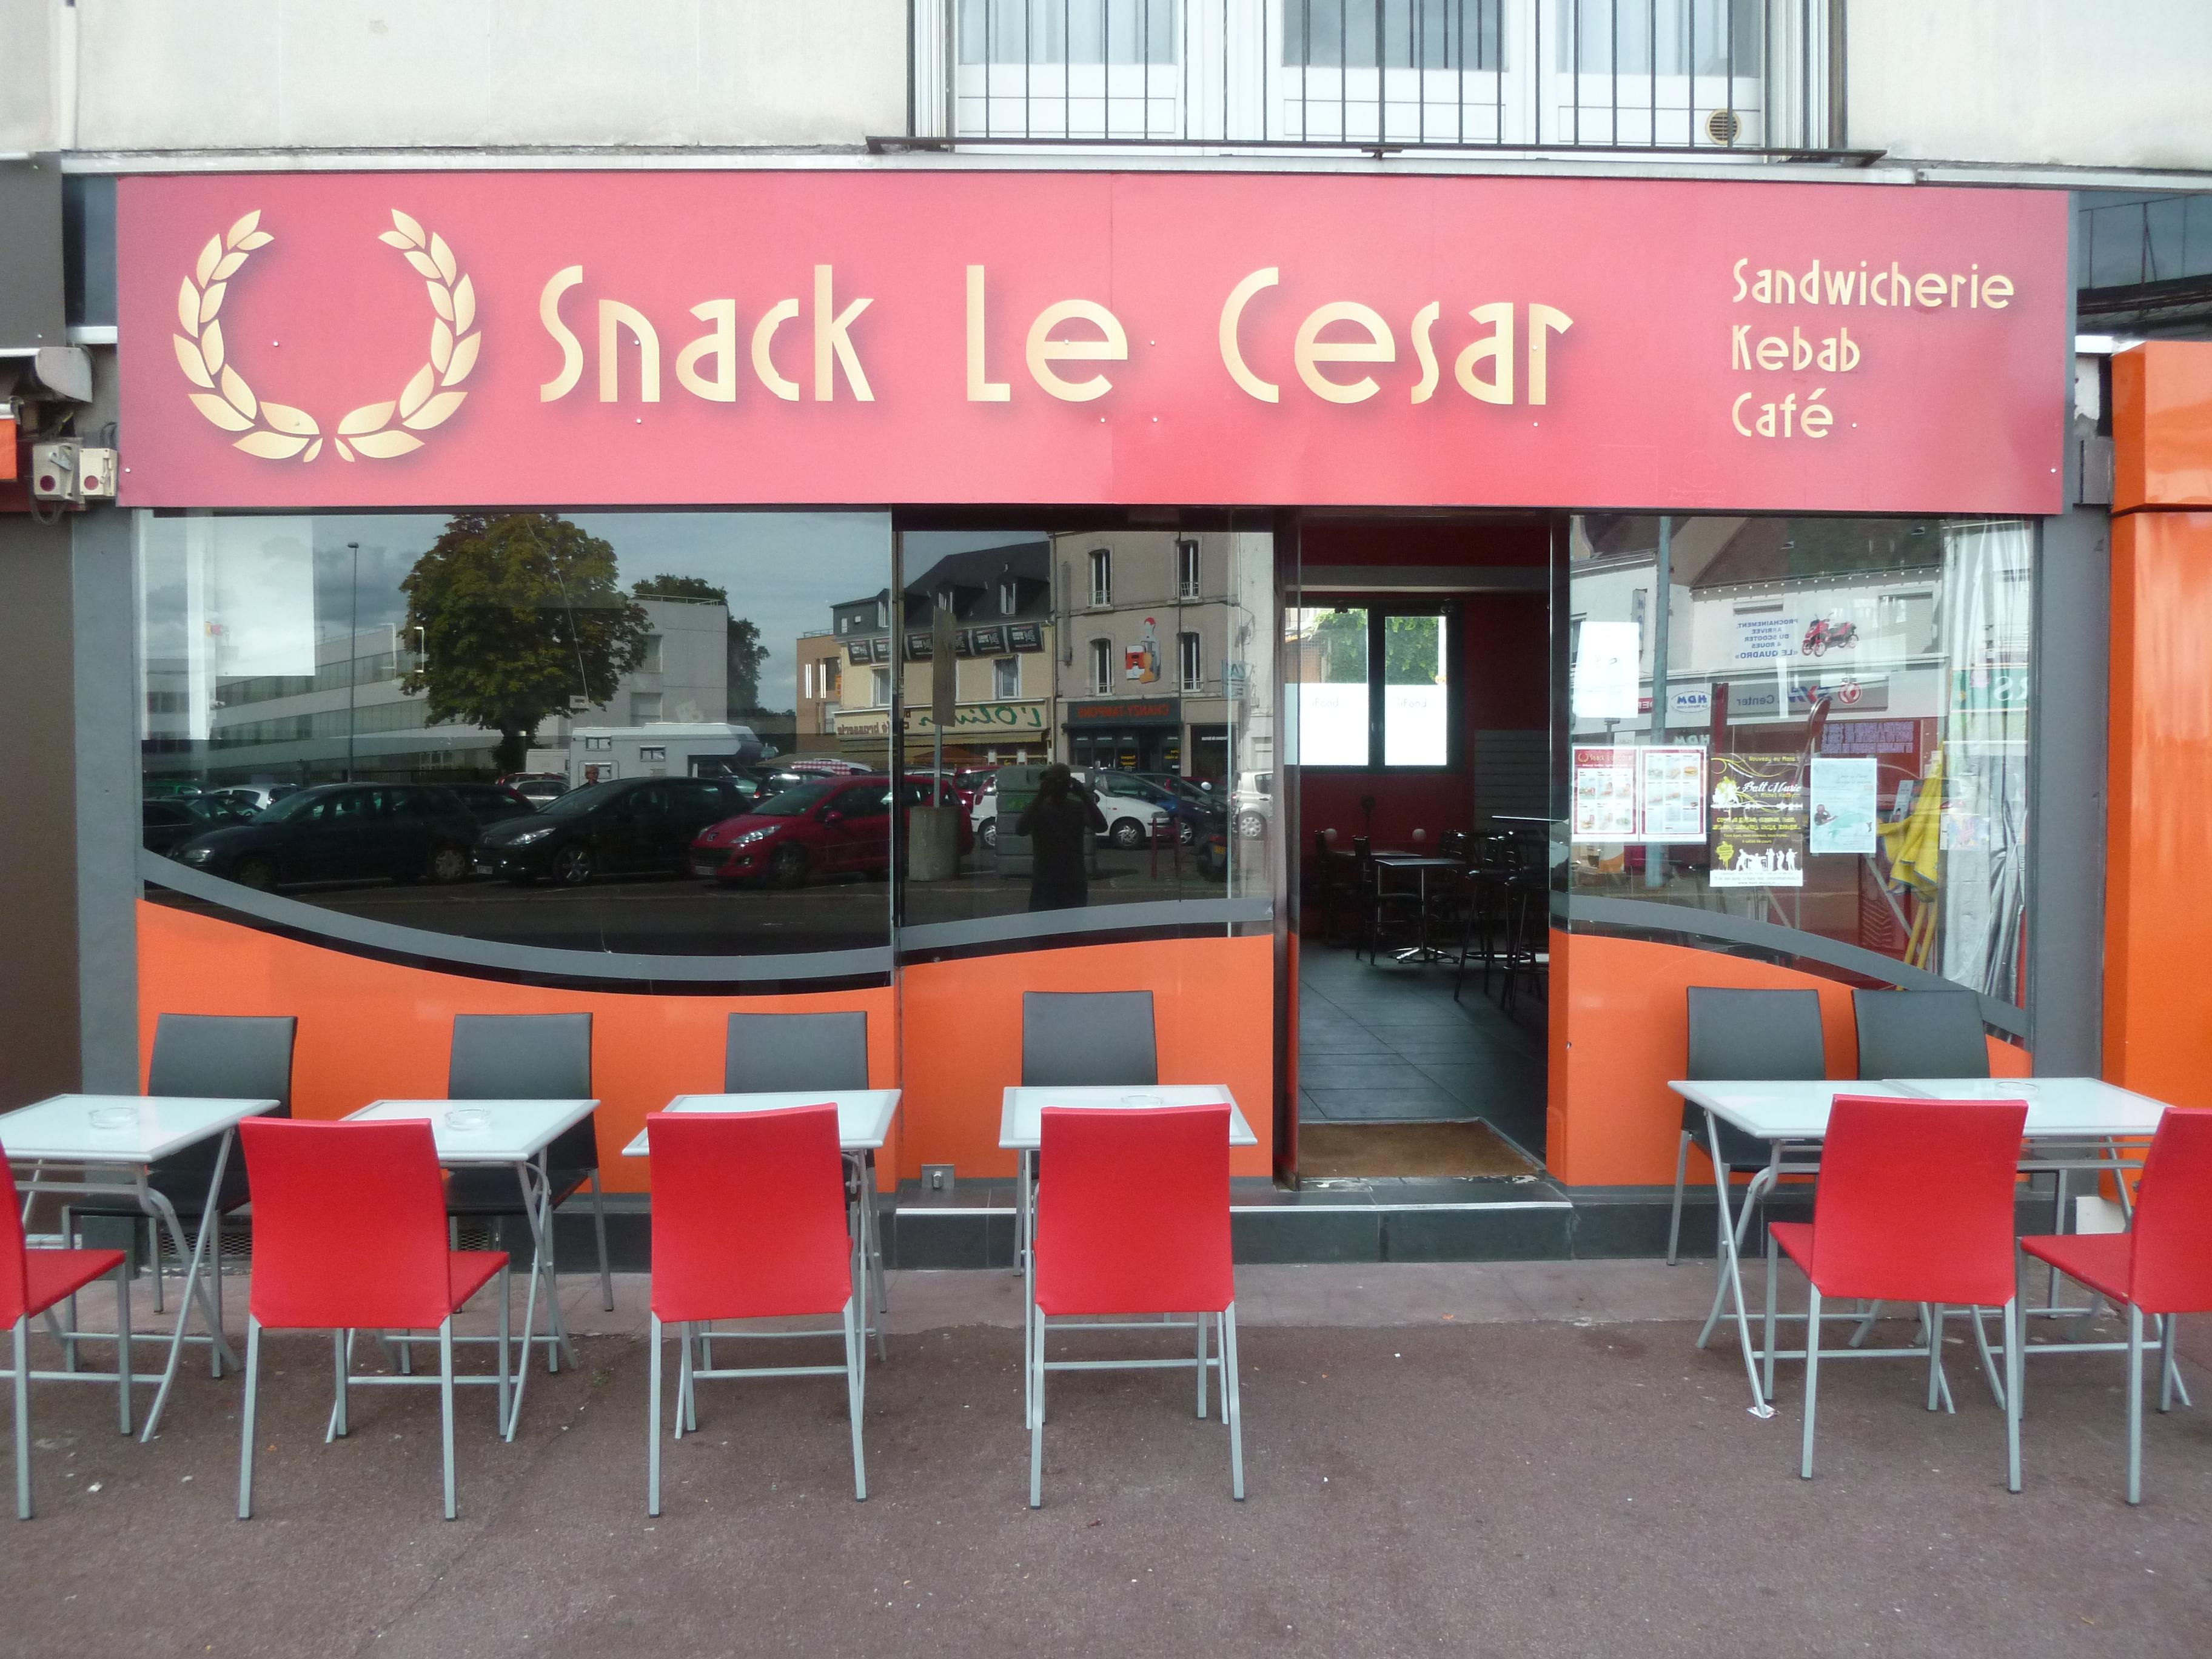 Snack Le César